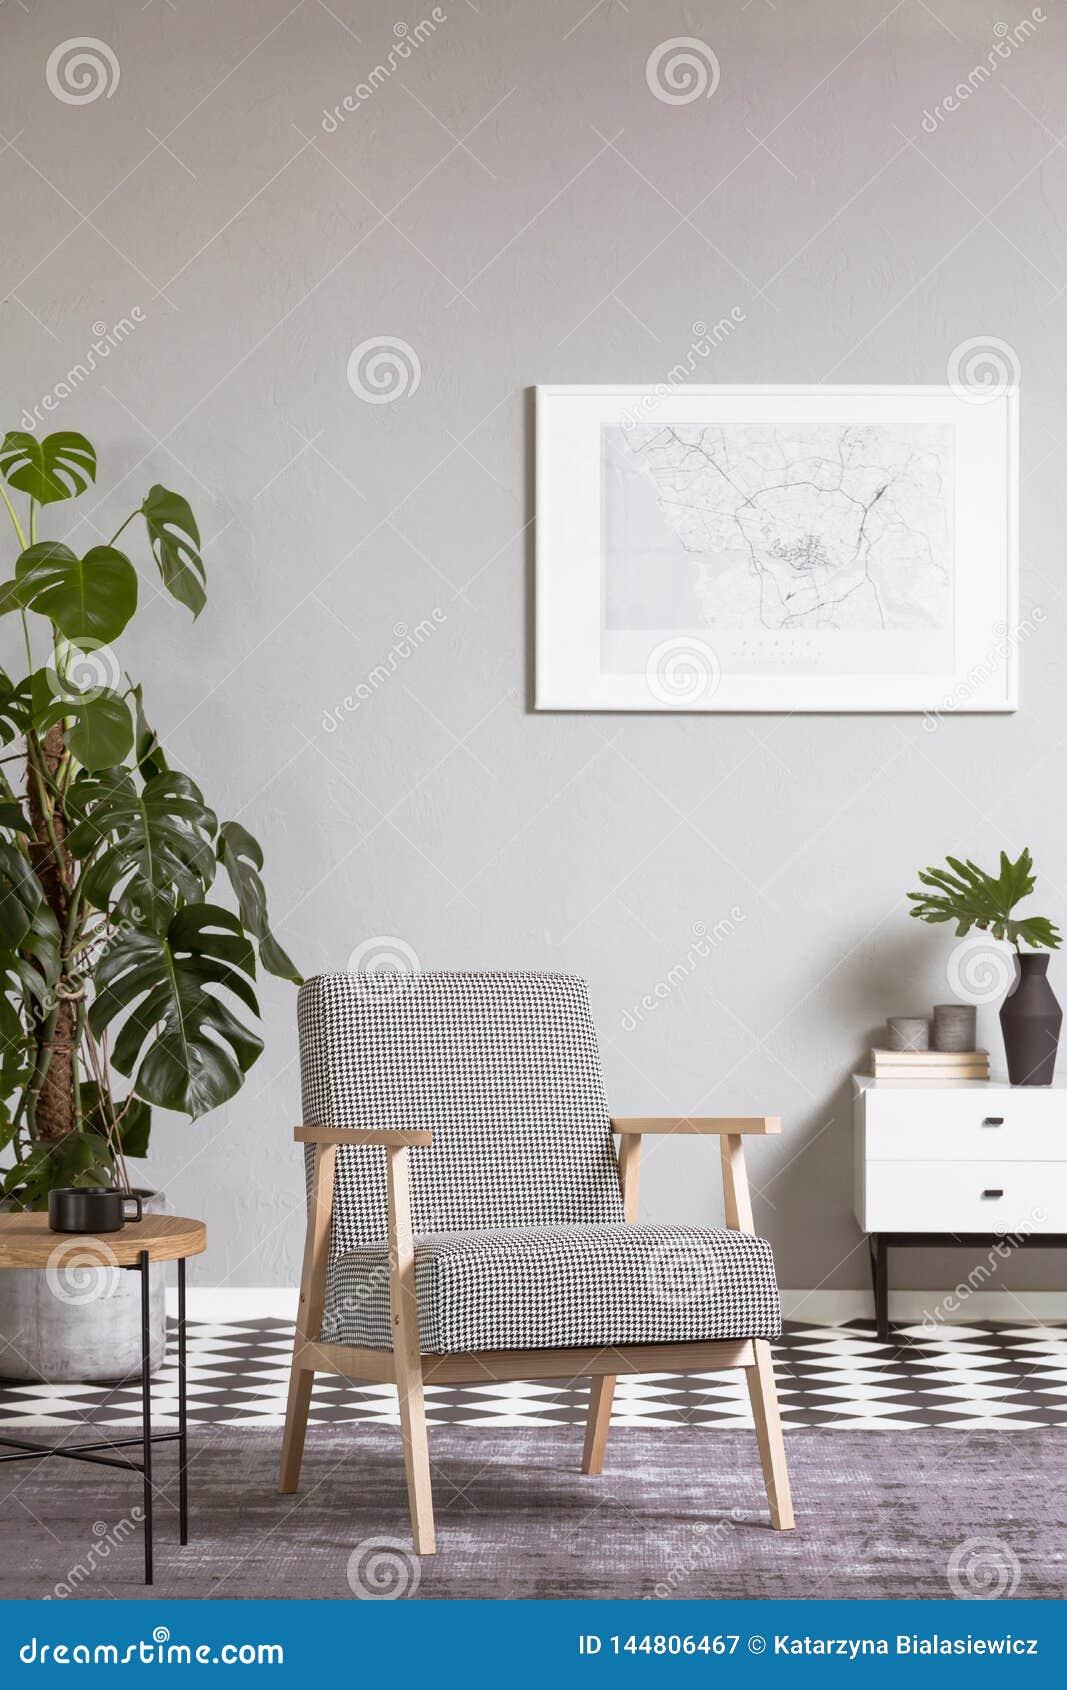 Poltrona elegante do vintage no interior da sala de visitas com pintura na parede